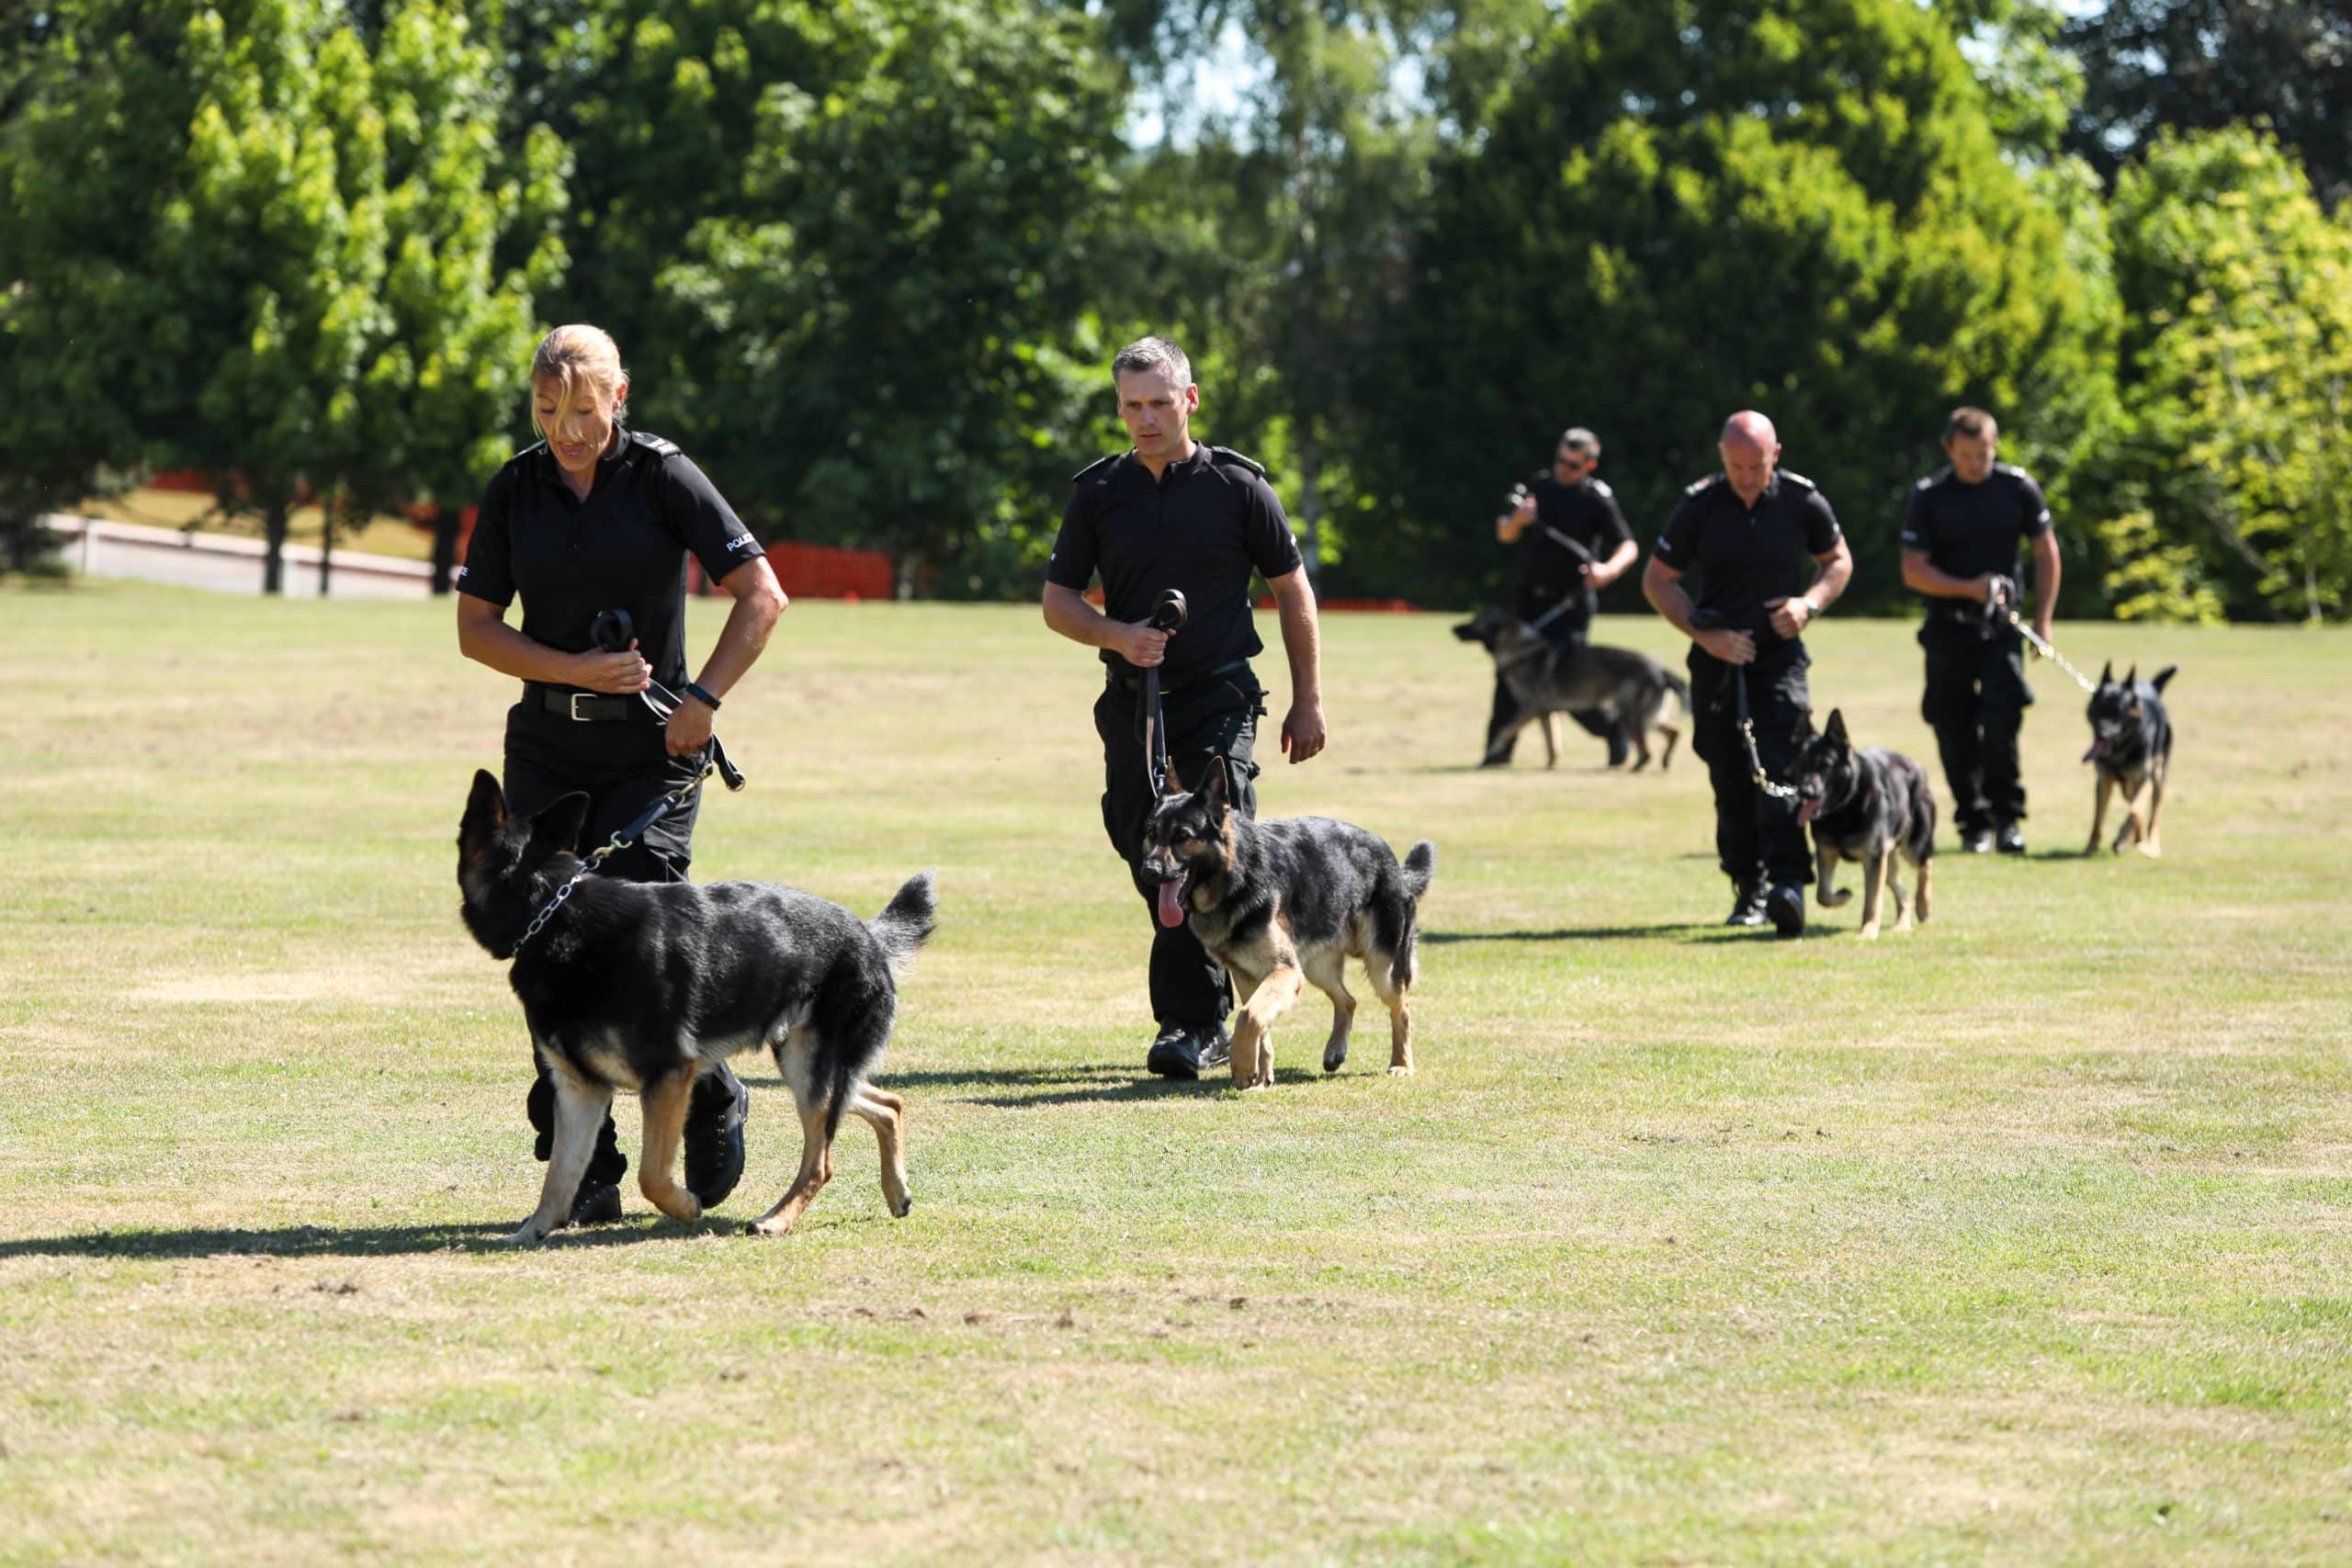 Surrey Police Dog Training School dogs walking